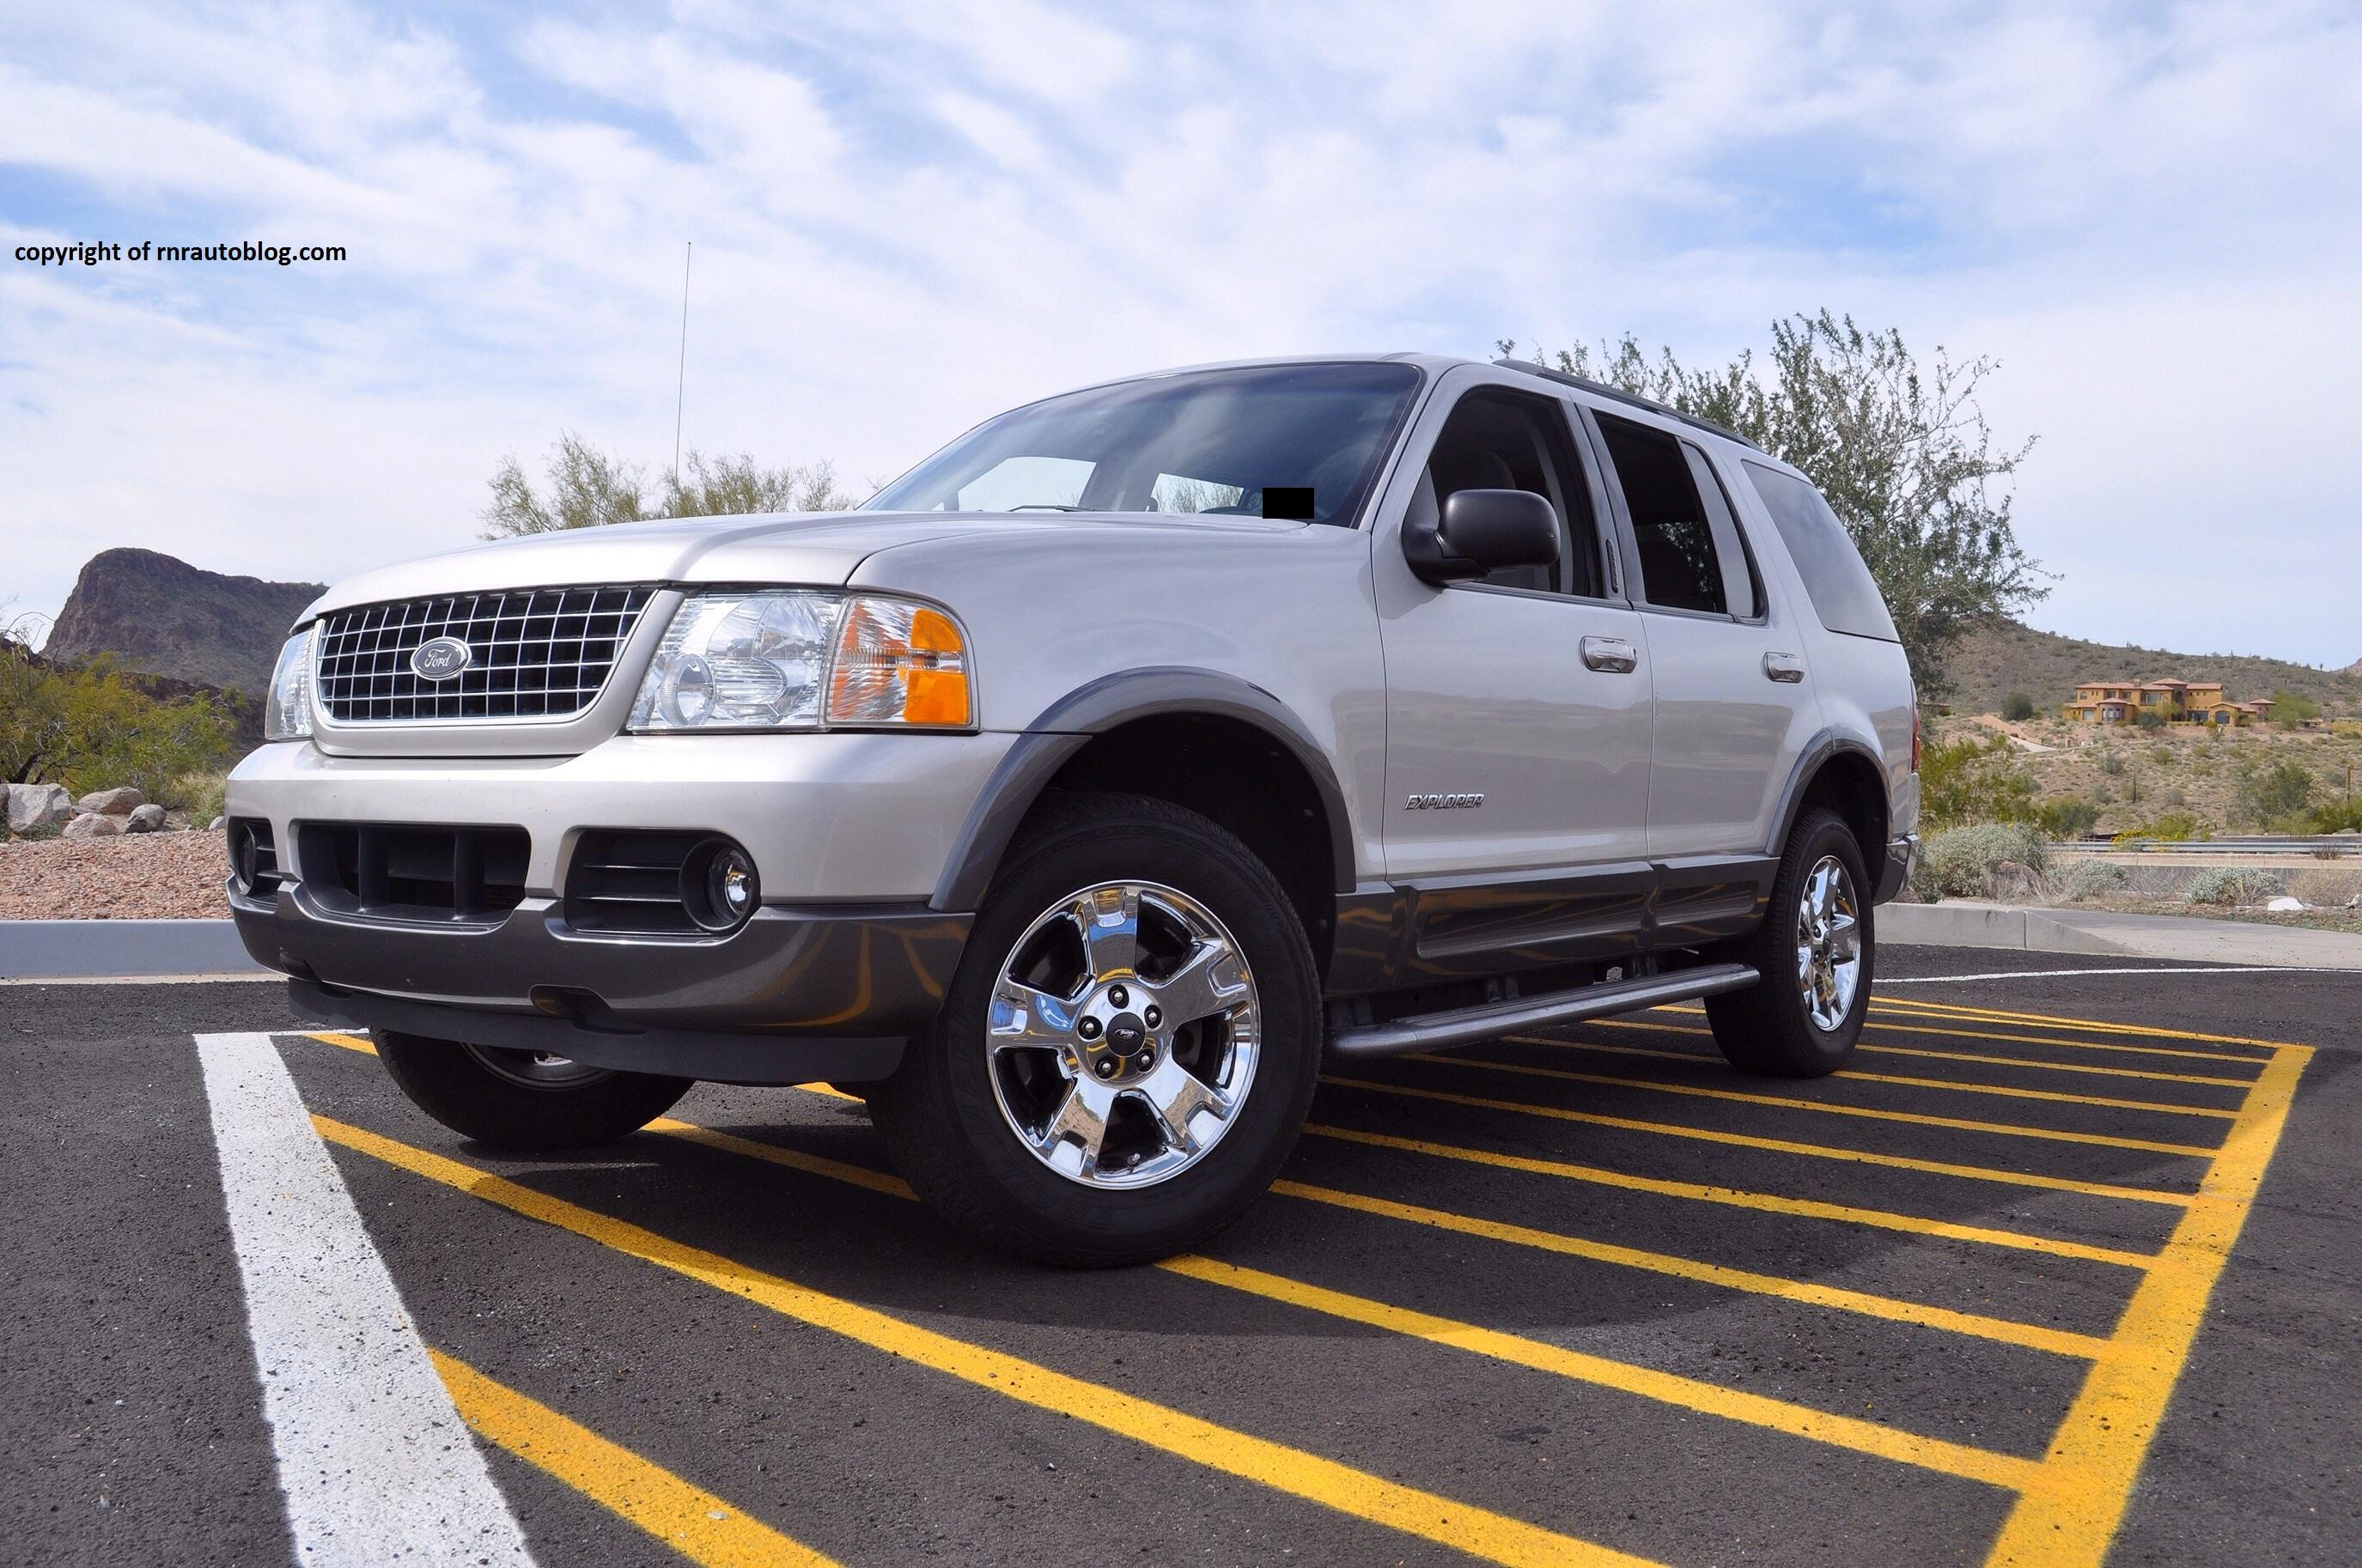 2004 Ford Explorer XLT Review | RNR Automotive Blog